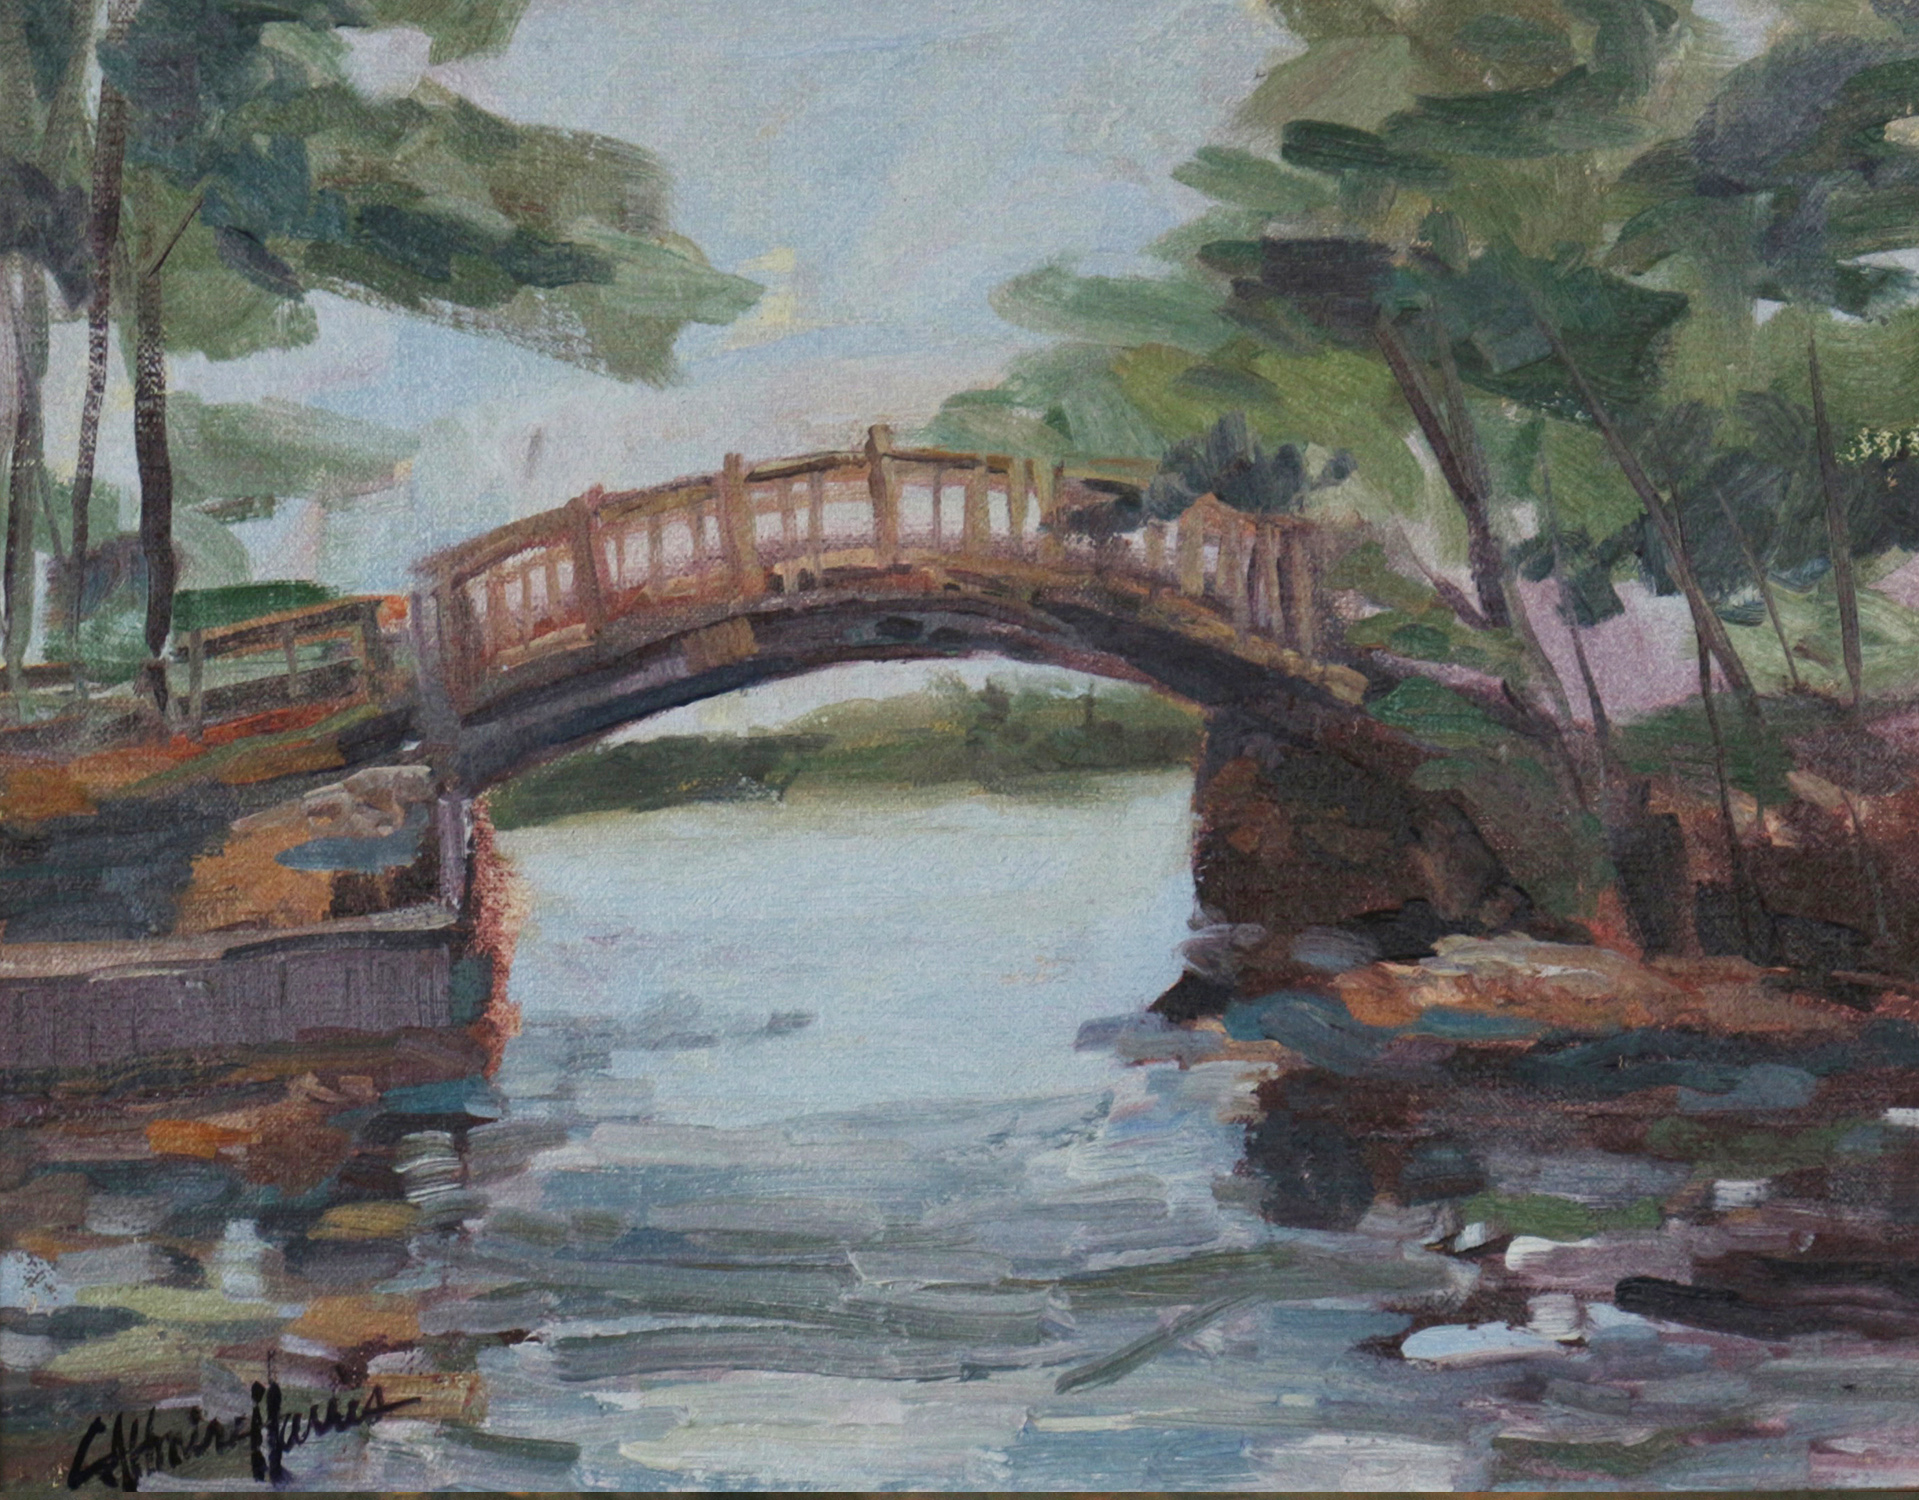 Brantingham Bridge to the Lily Pond